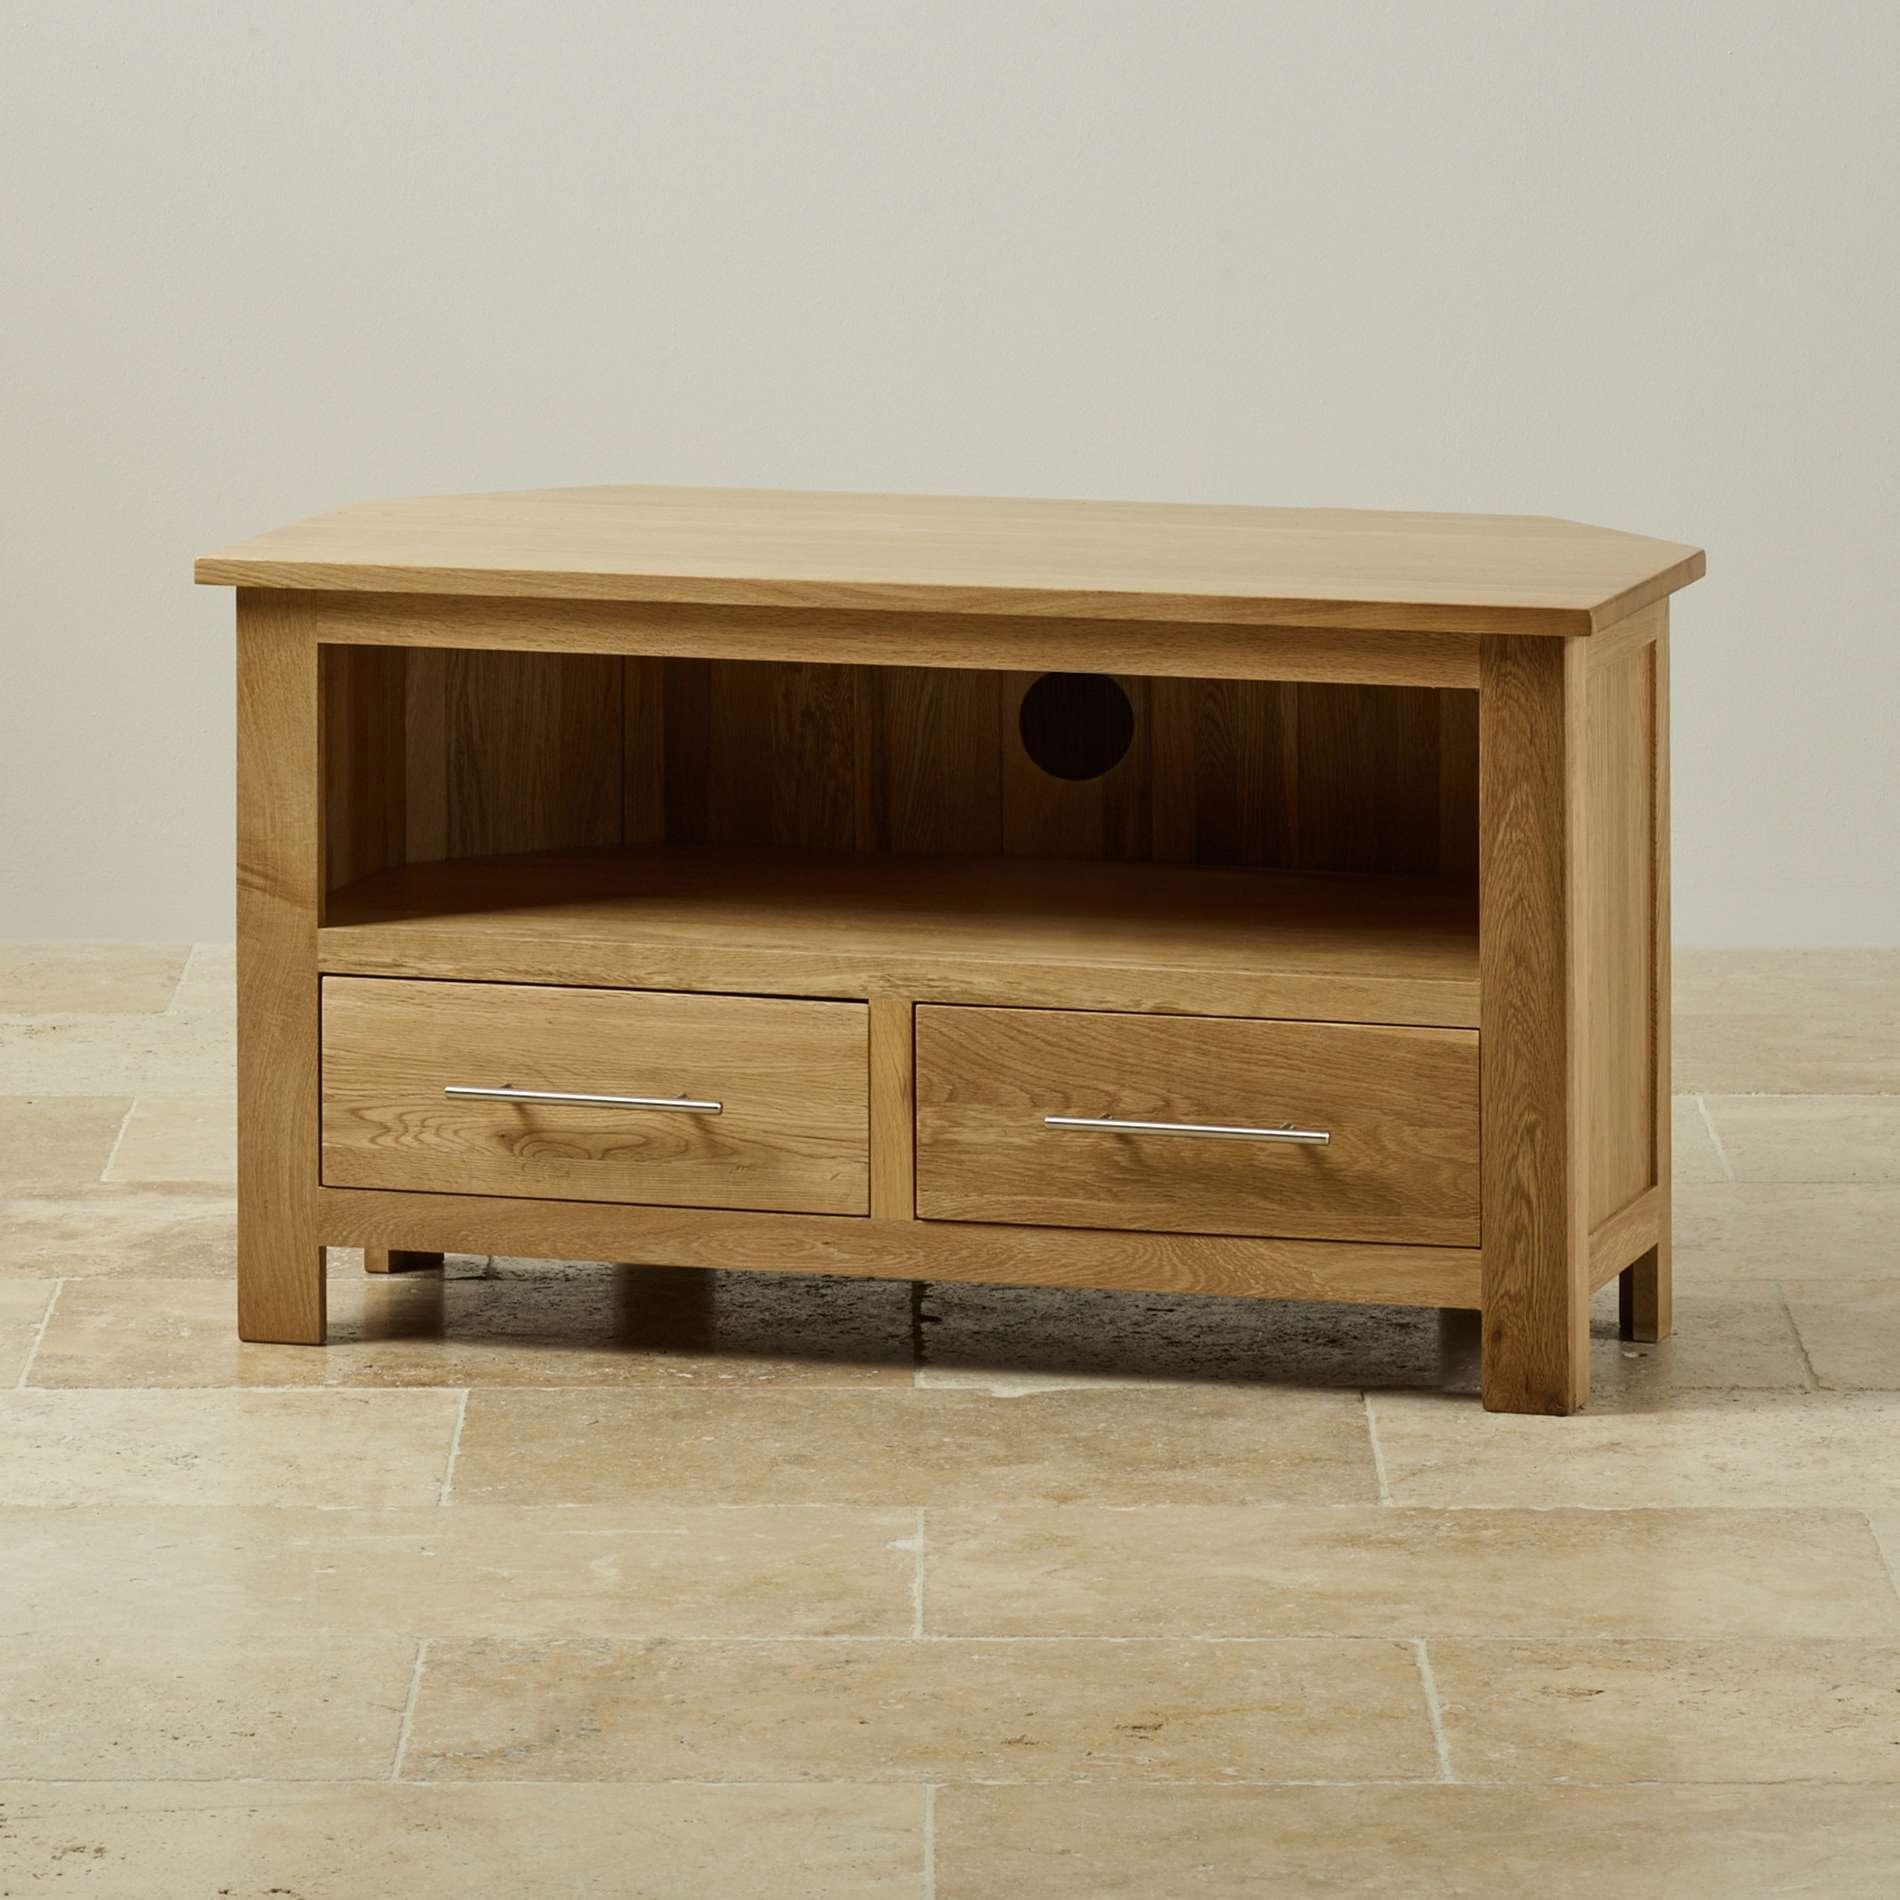 Tv Cabinets | Mango, Painted & Oak Tv Units | Oak Furniture Land In Light Oak Corner Tv Cabinets (View 18 of 20)